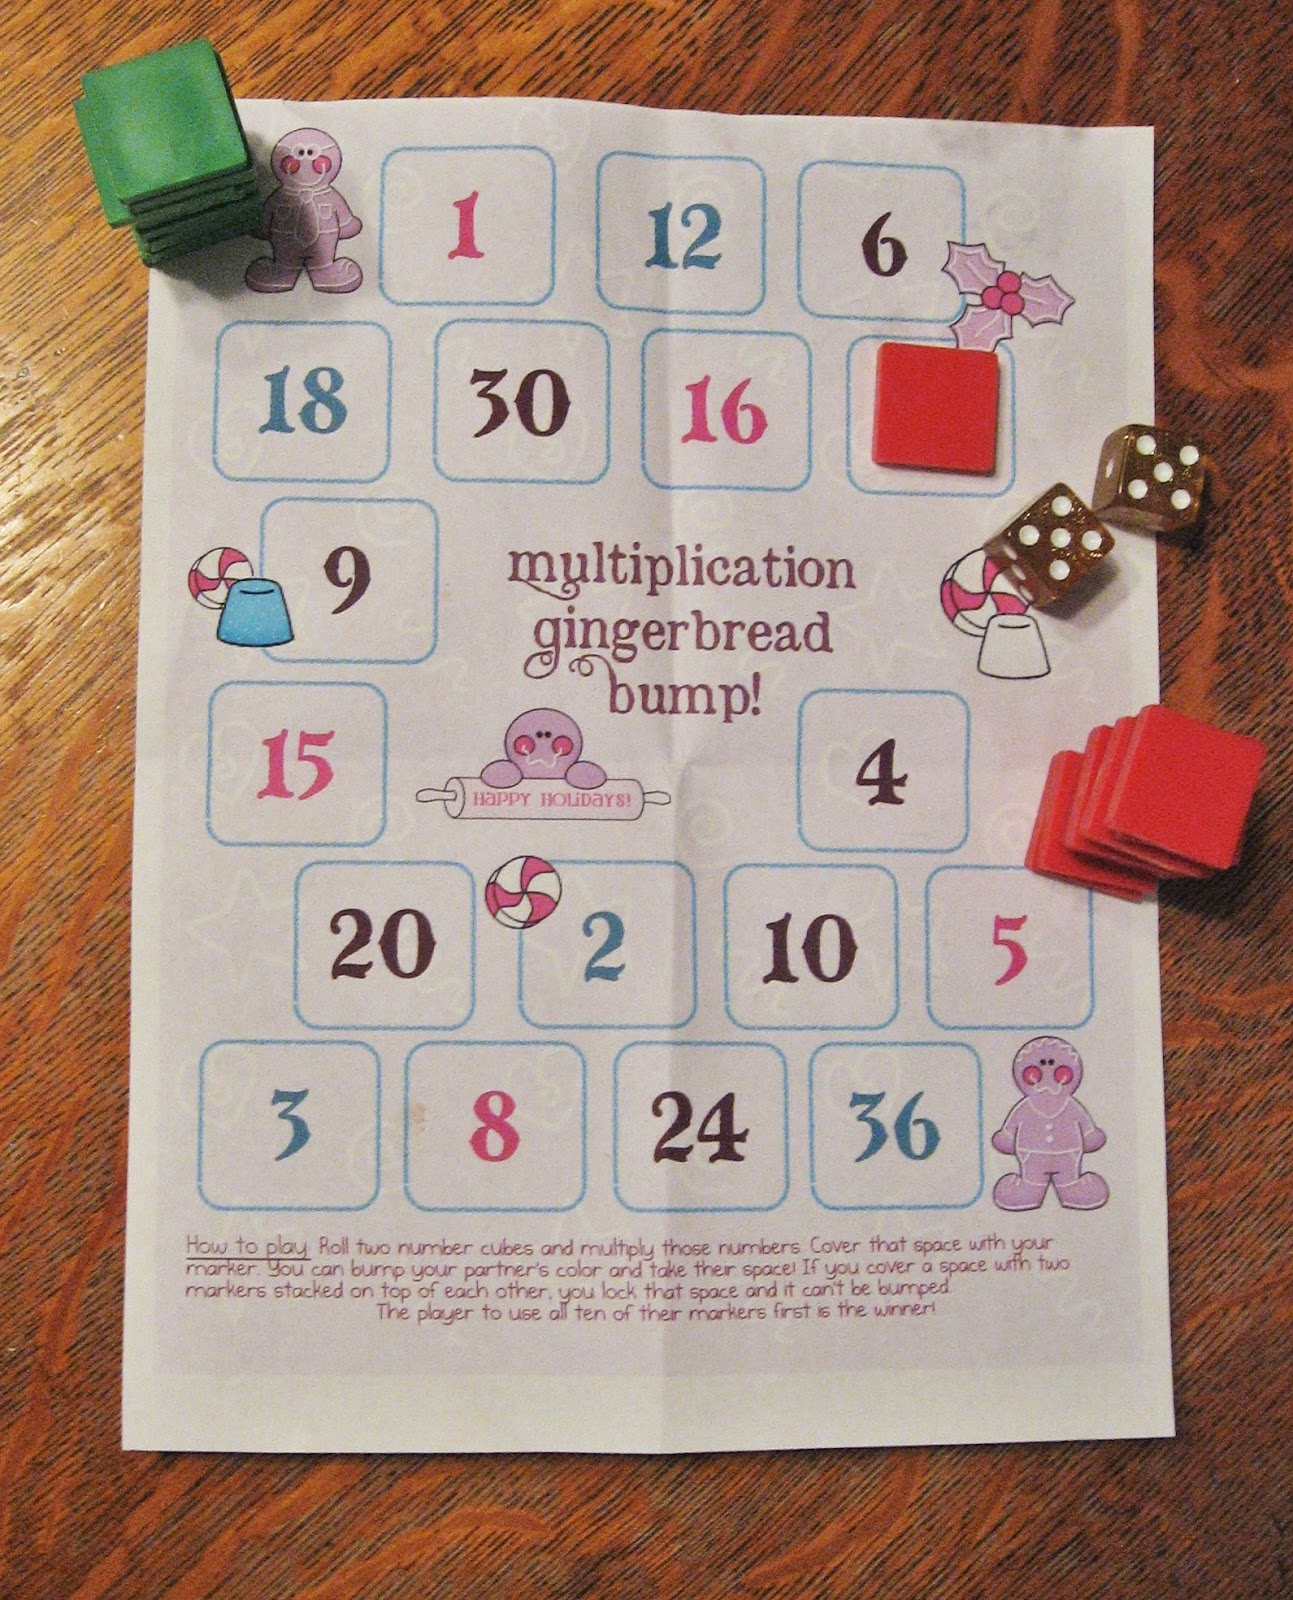 Worksheets Online Multiplication Worksheets almost unschoolers 23 free christmas multiplication worksheets and printable or online games